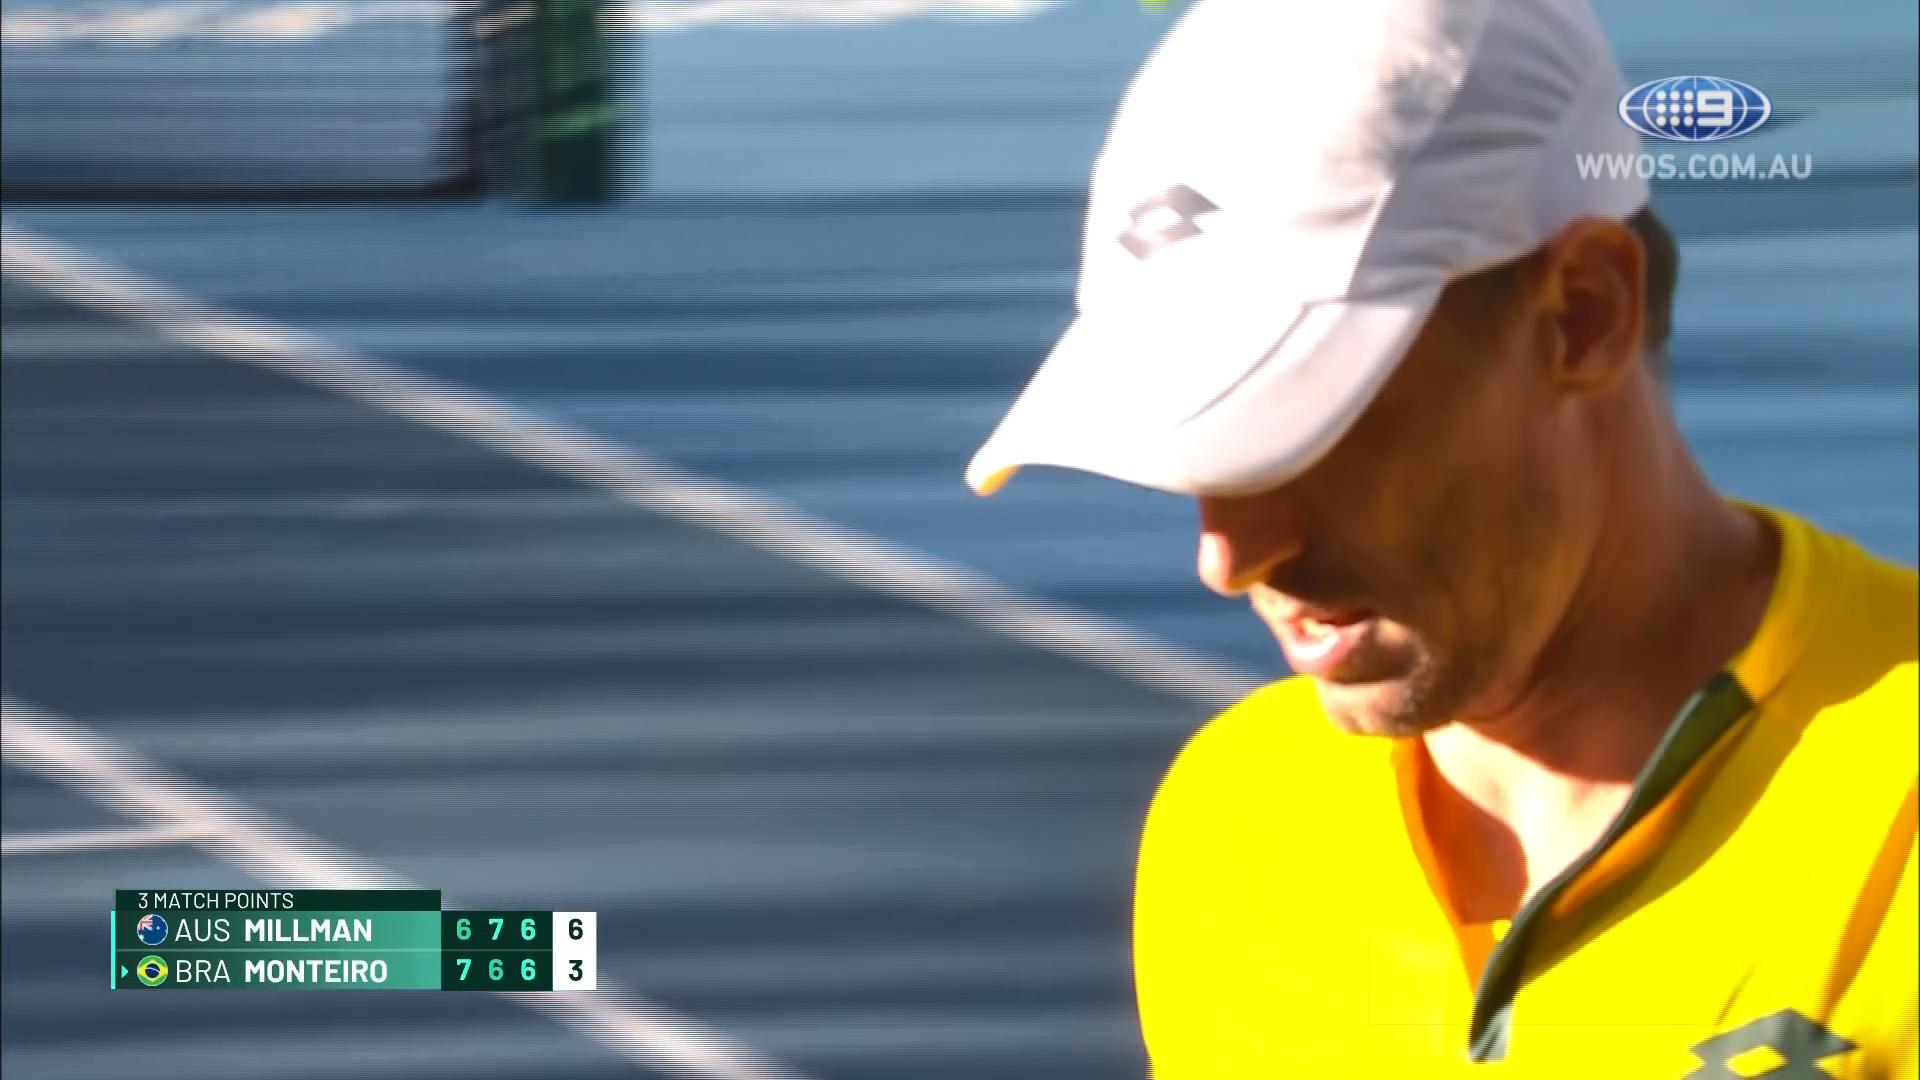 Davis Cup Qualifiers 2020: Millman v Monteiro